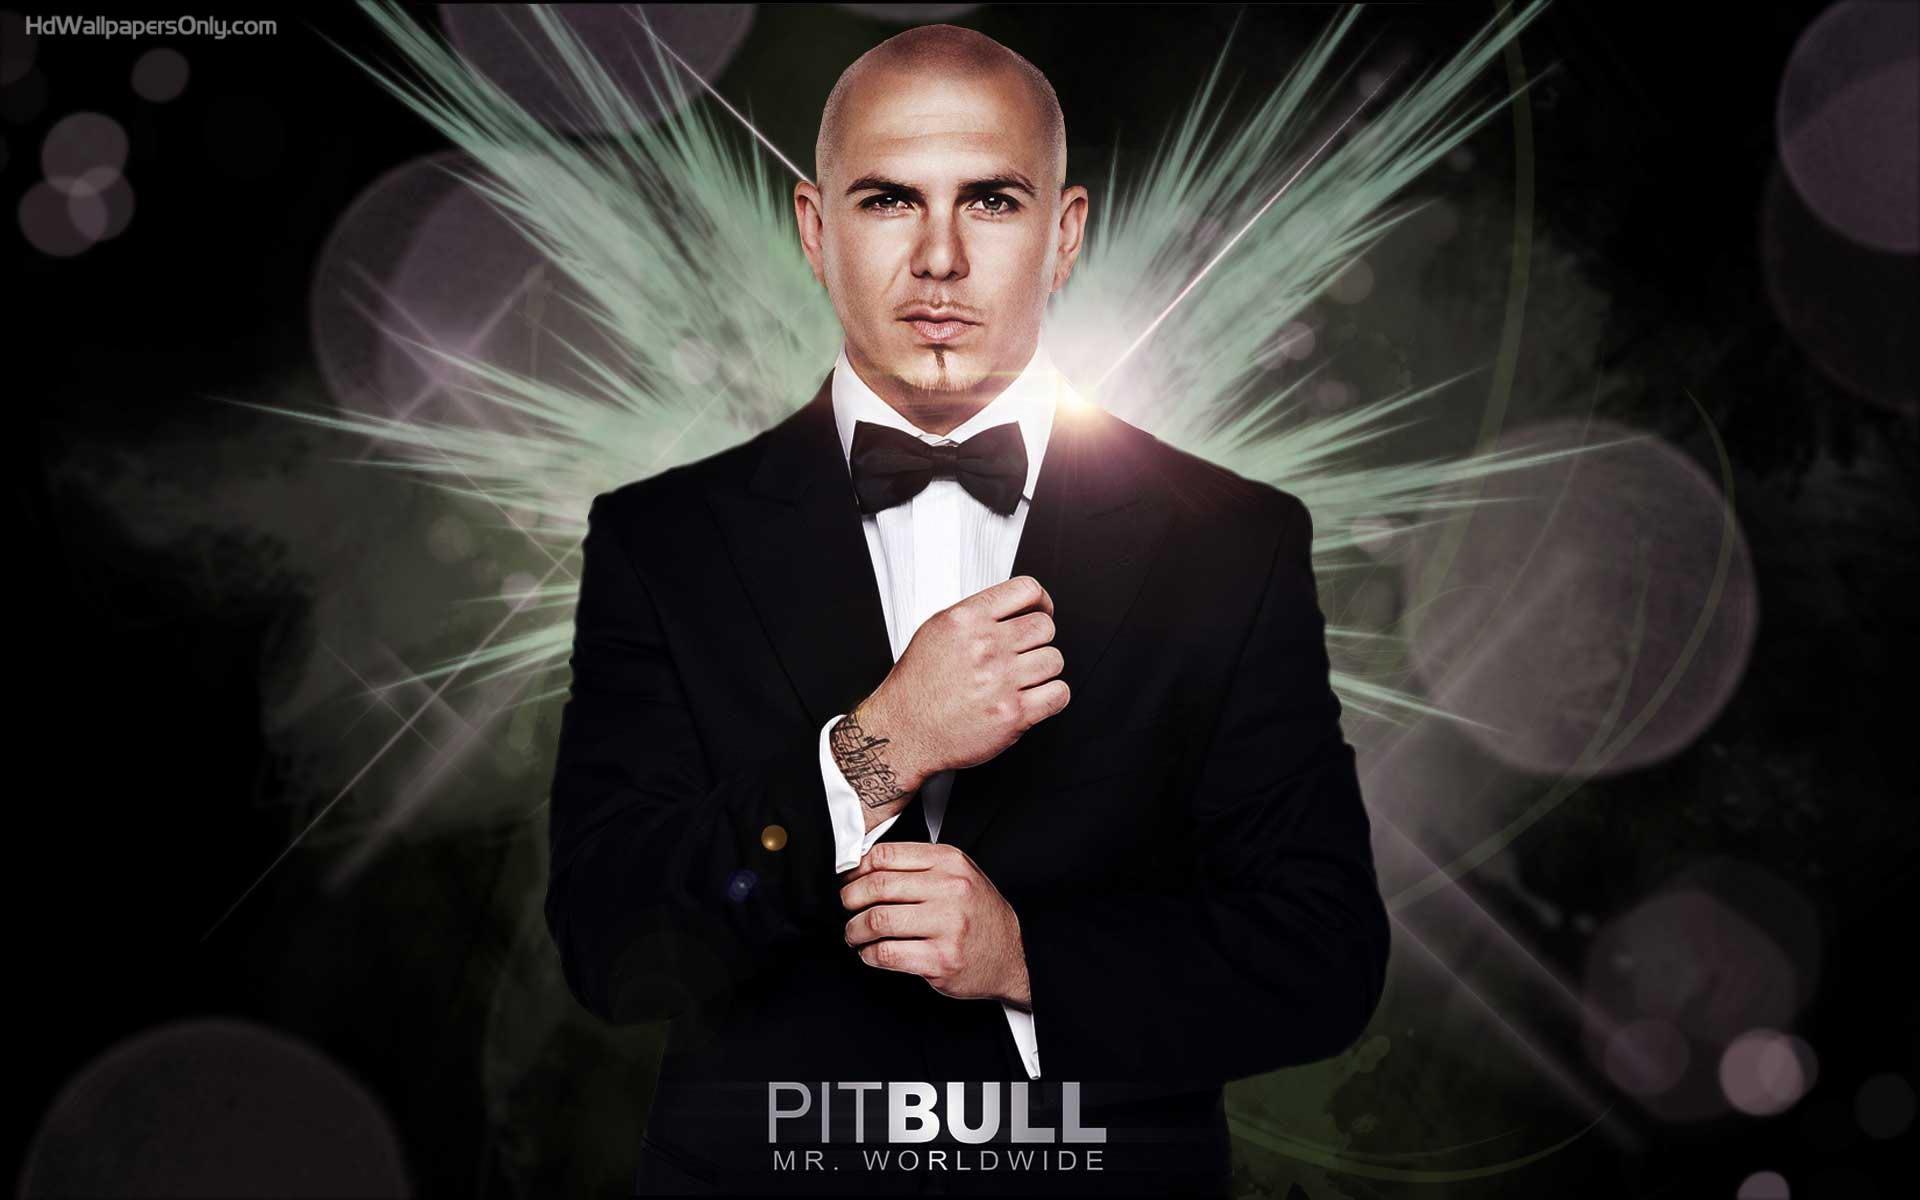 Pitbull HD Images 5 | Pitbull HD Images | Pinterest | Hd images and Pitbull